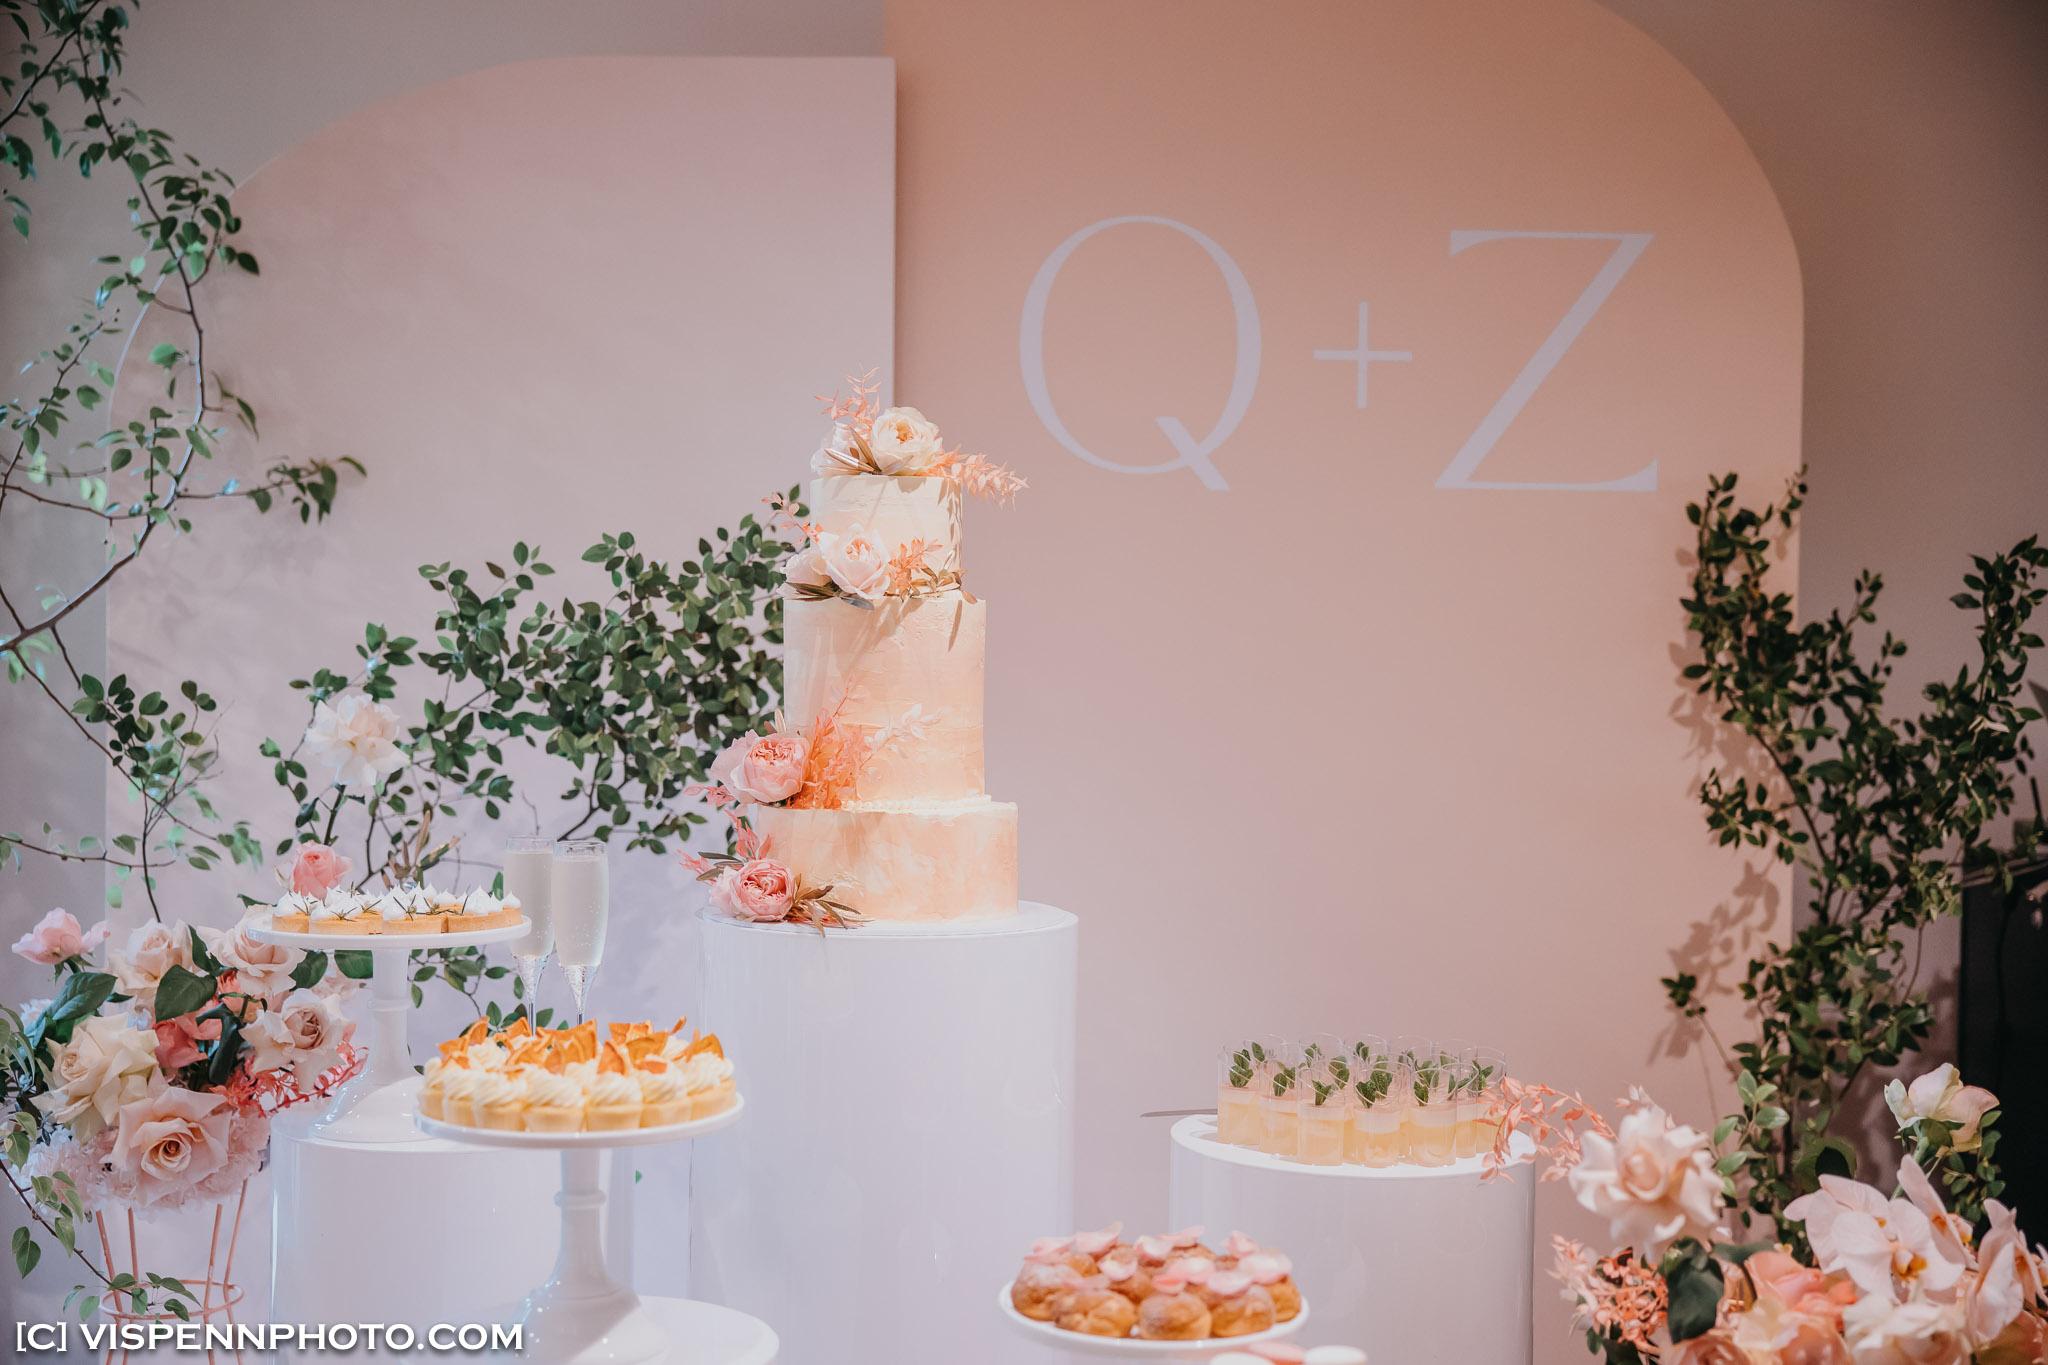 WEDDING DAY Photography Melbourne VISPENN 墨尔本 婚礼跟拍 婚礼摄像 婚礼摄影 结婚照 登记照 ElitaPB 09825 1P EOSR VISPENN